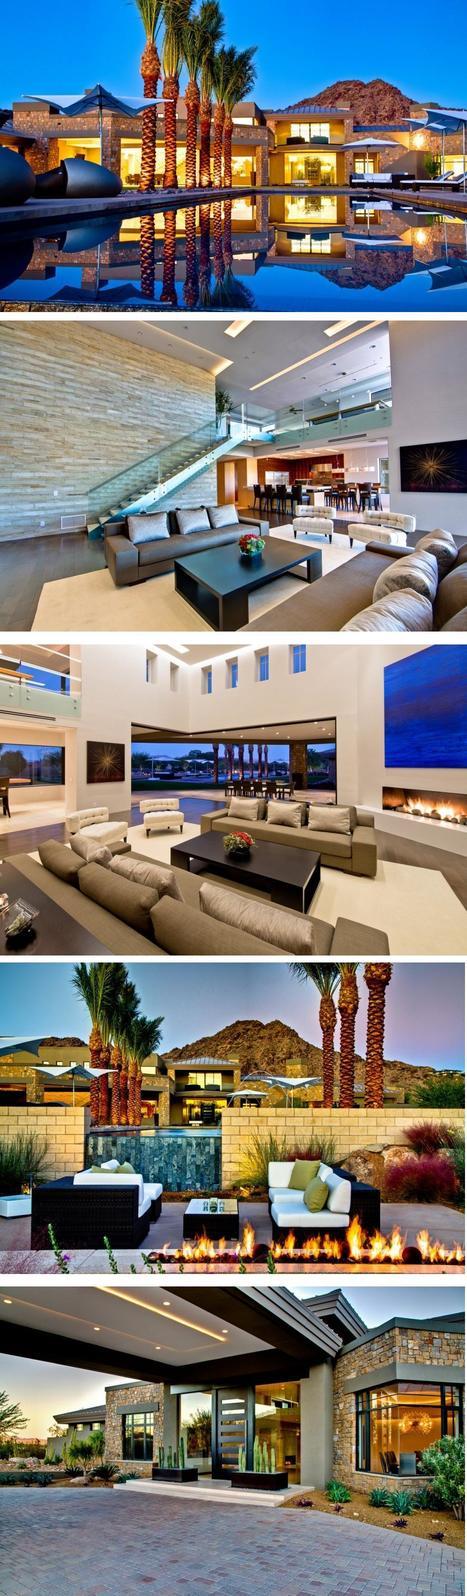 Casa Paradise Valley : Remodelada por Kendle Design Collaborative | Arquitectura Del Siglo XXI | Scoop.it